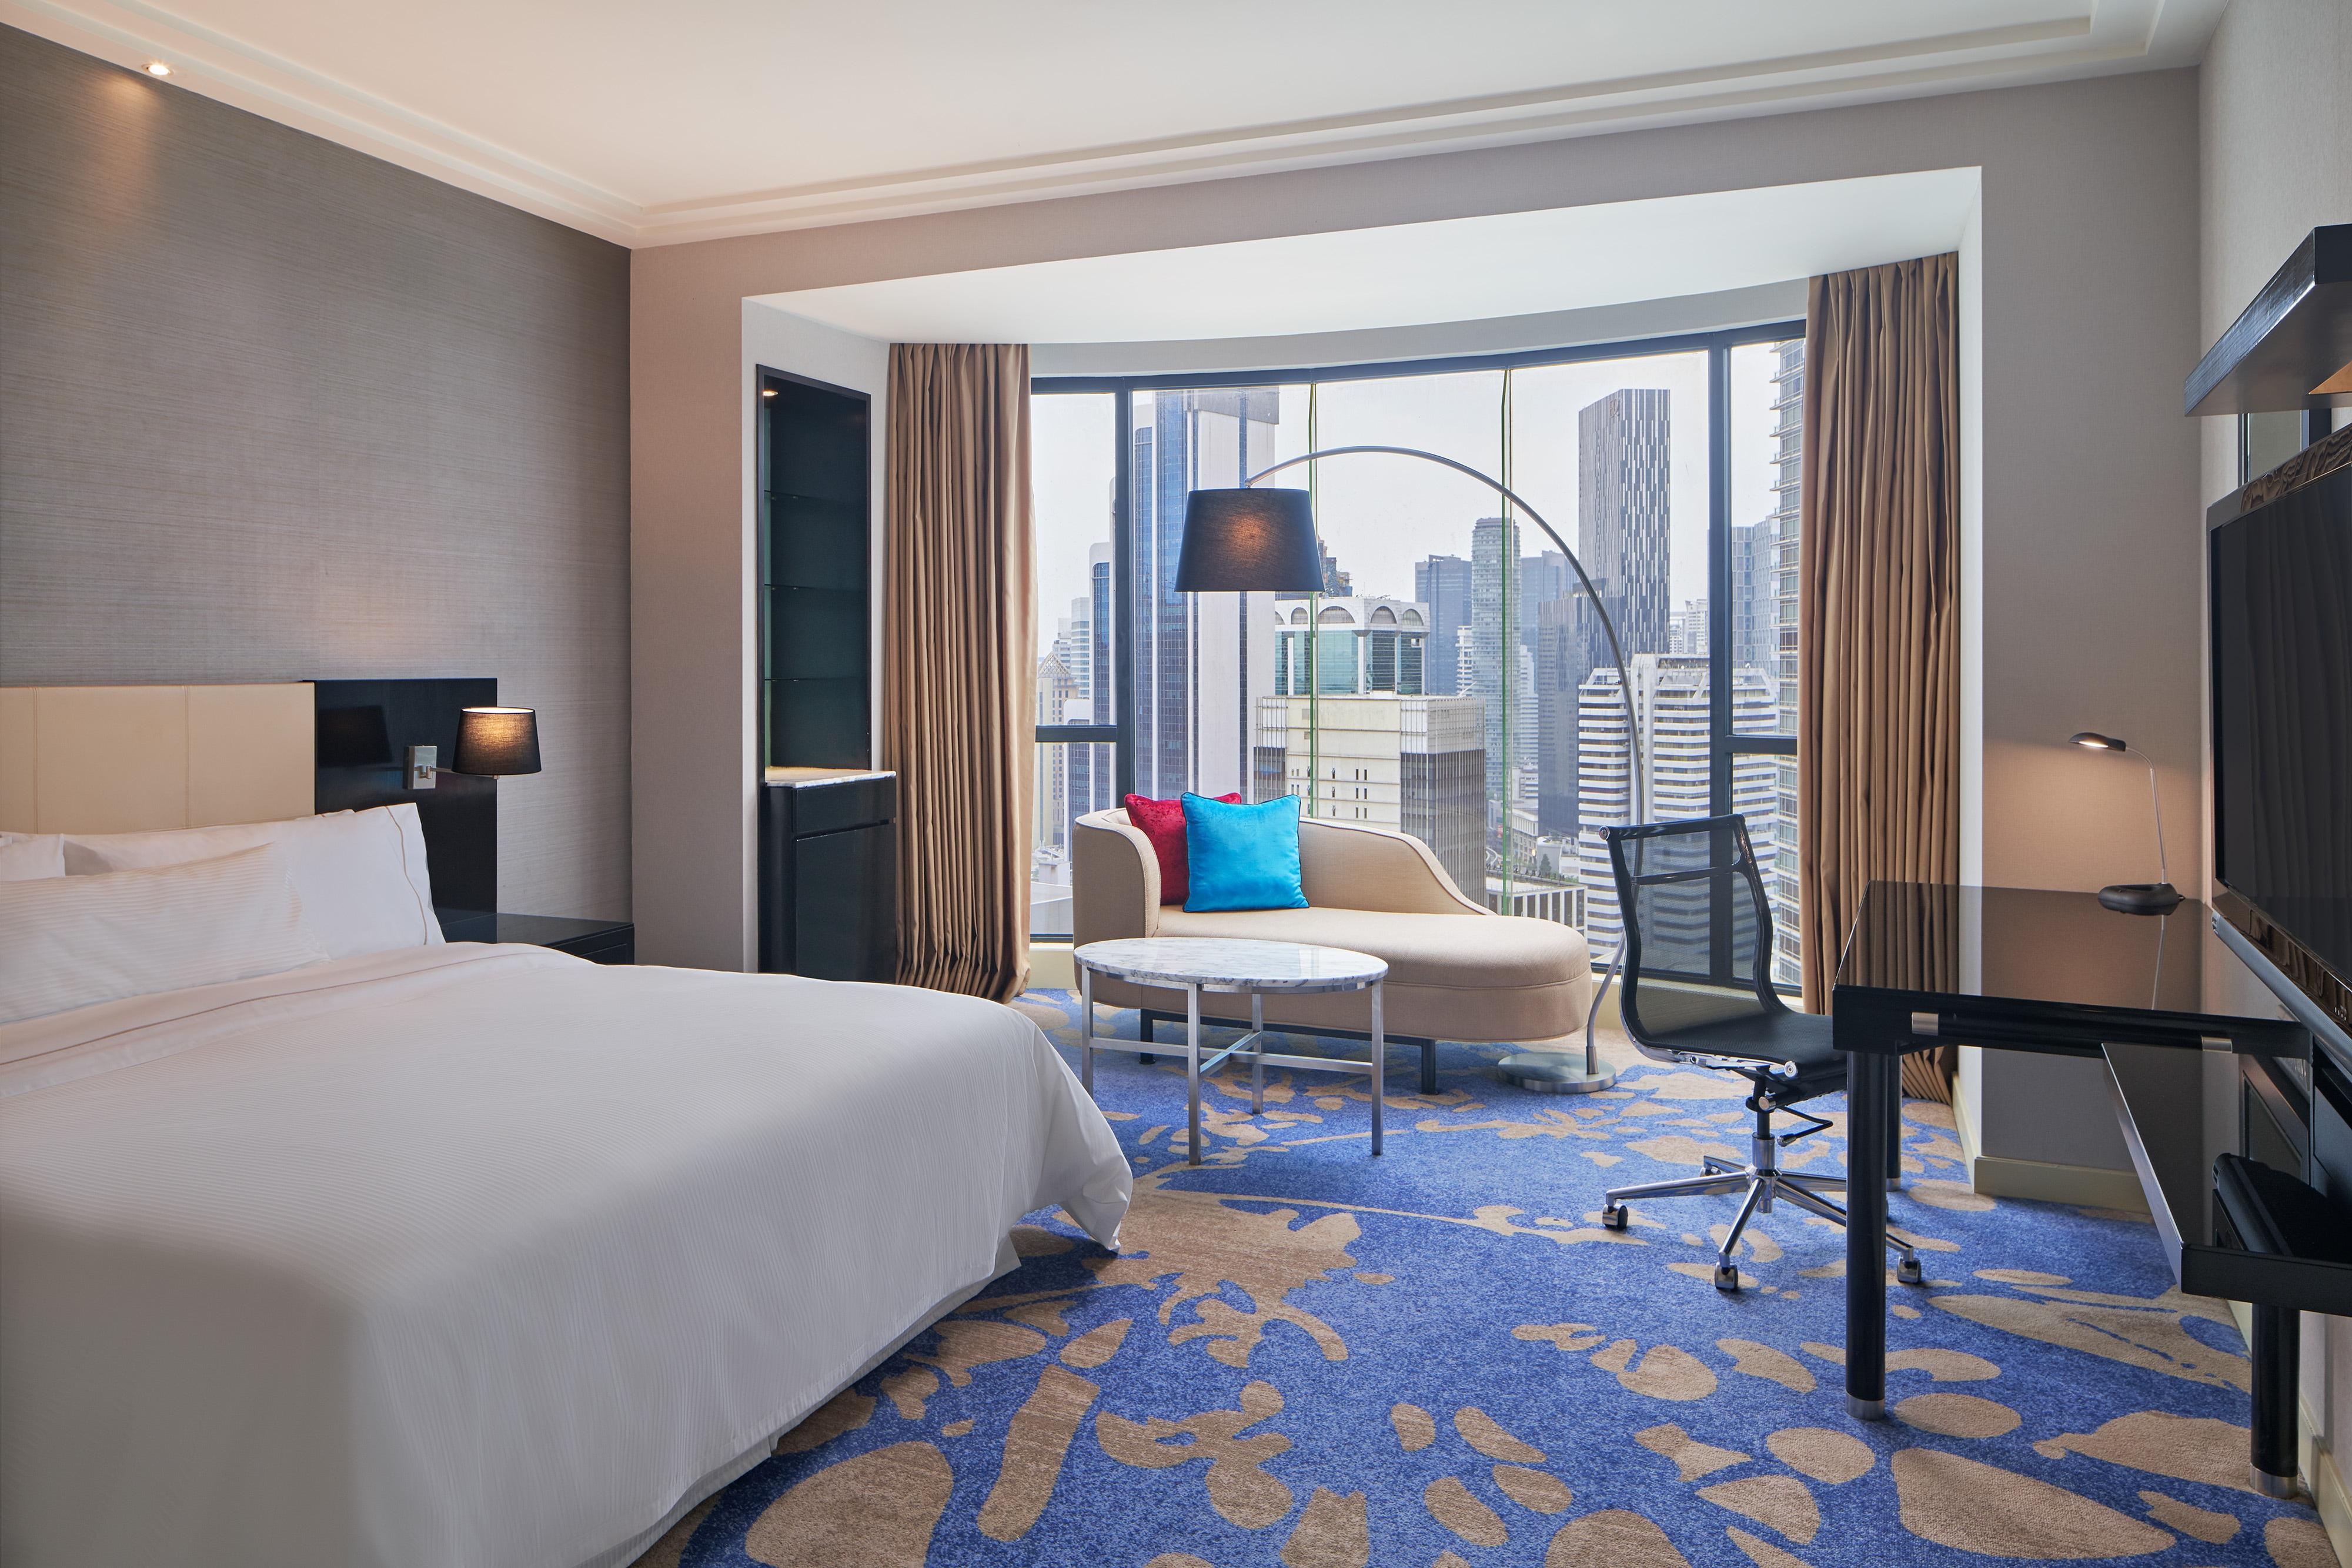 Premium-Gästezimmer mit Kingsize-Bett